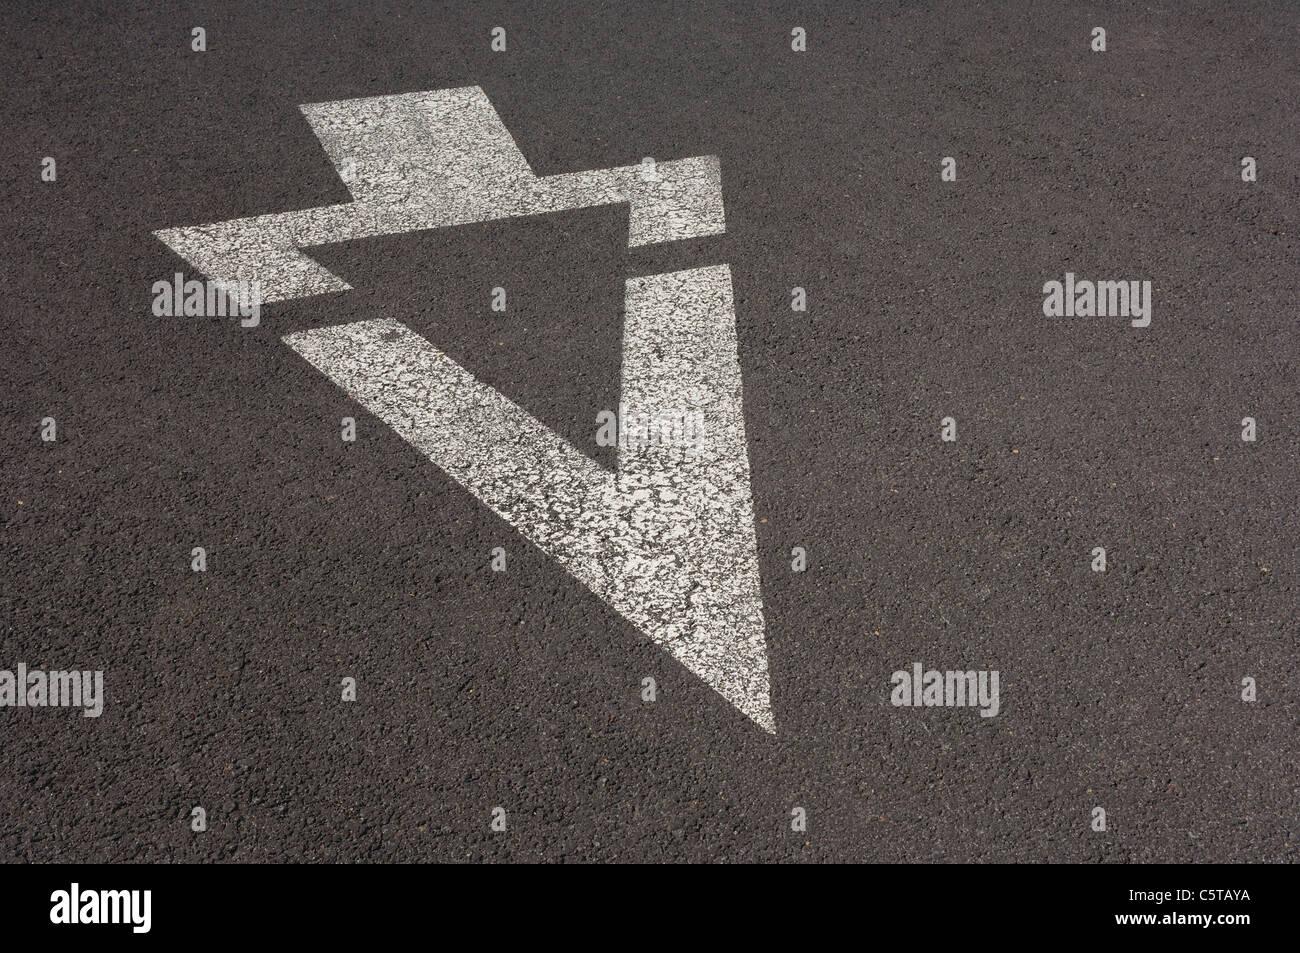 USA, White arrow sign, marking on street - Stock Image